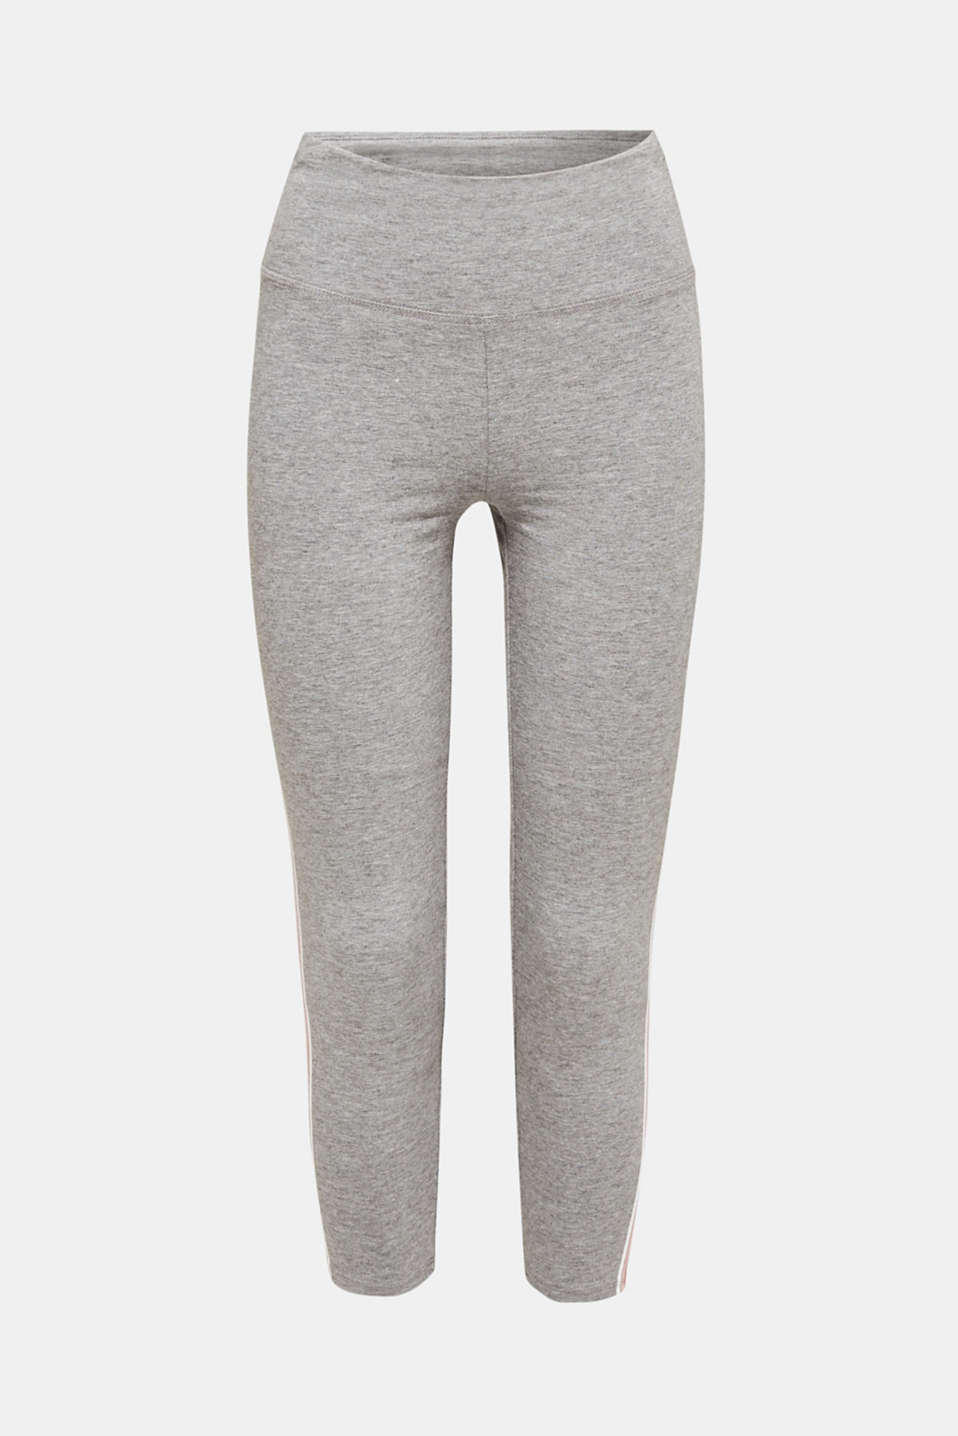 Pants knitted, MEDIUM GREY 2, detail image number 6